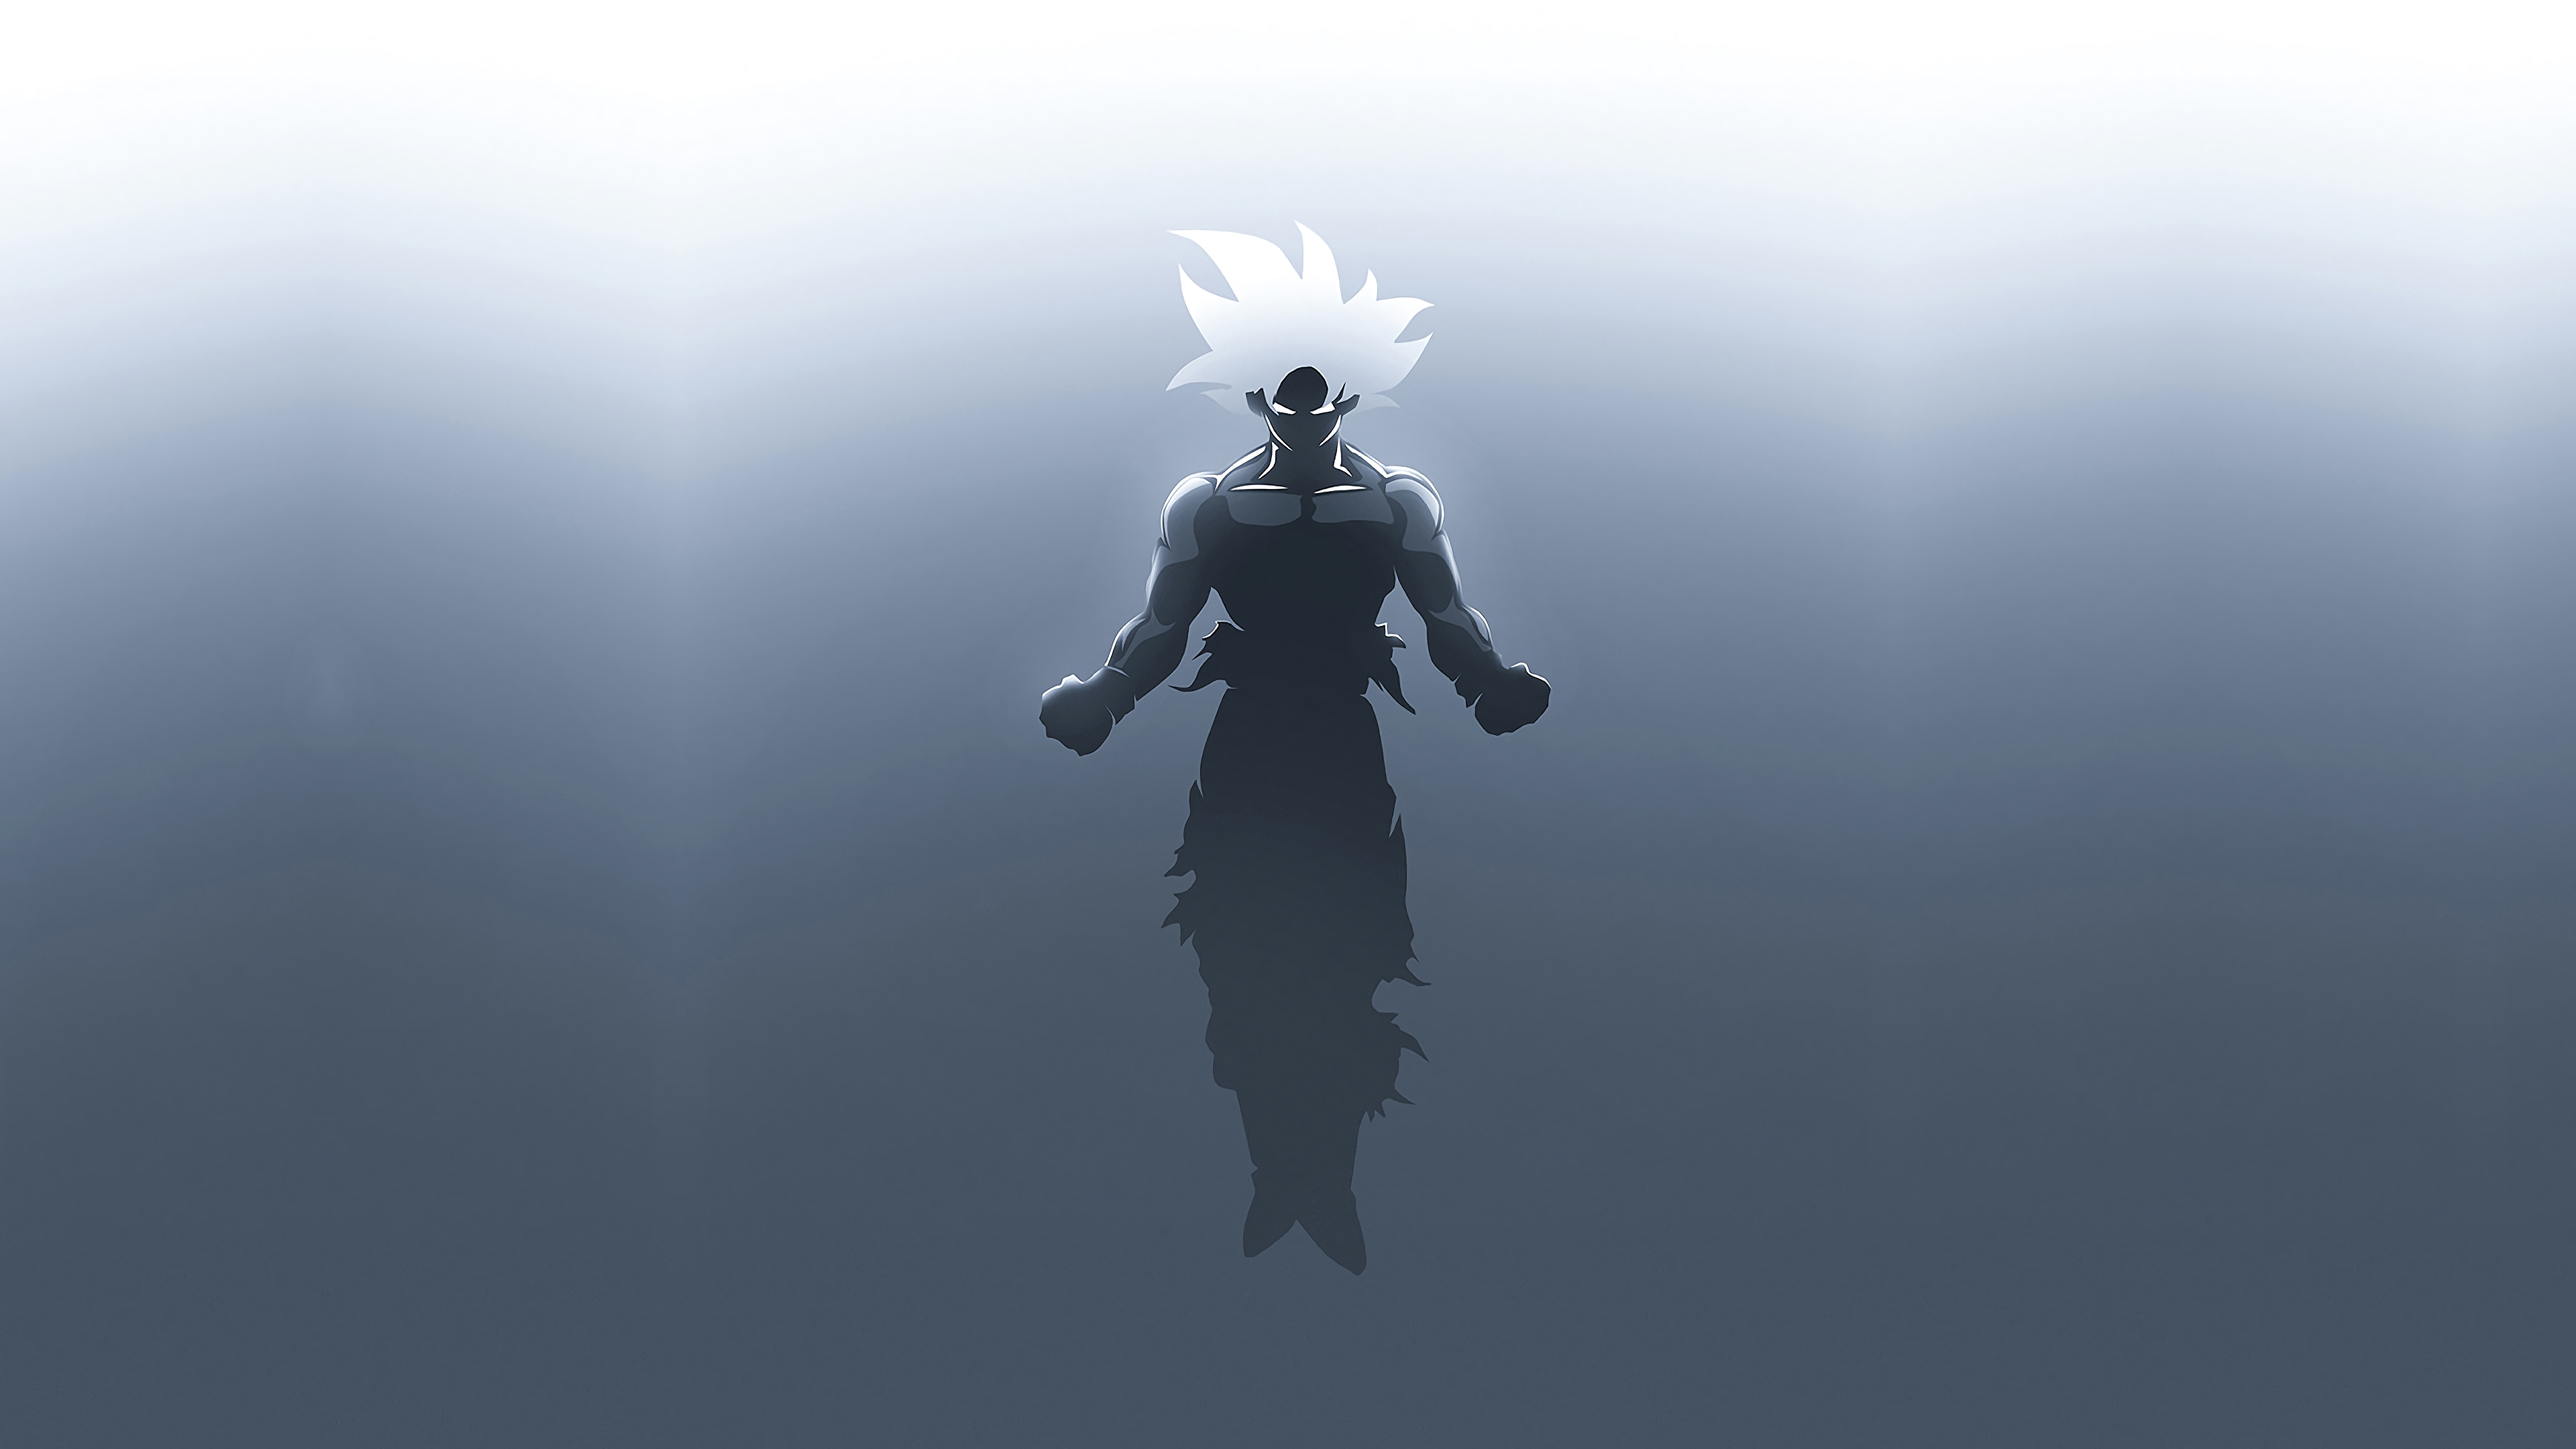 Goku In Dragon Ball Super Minimalism